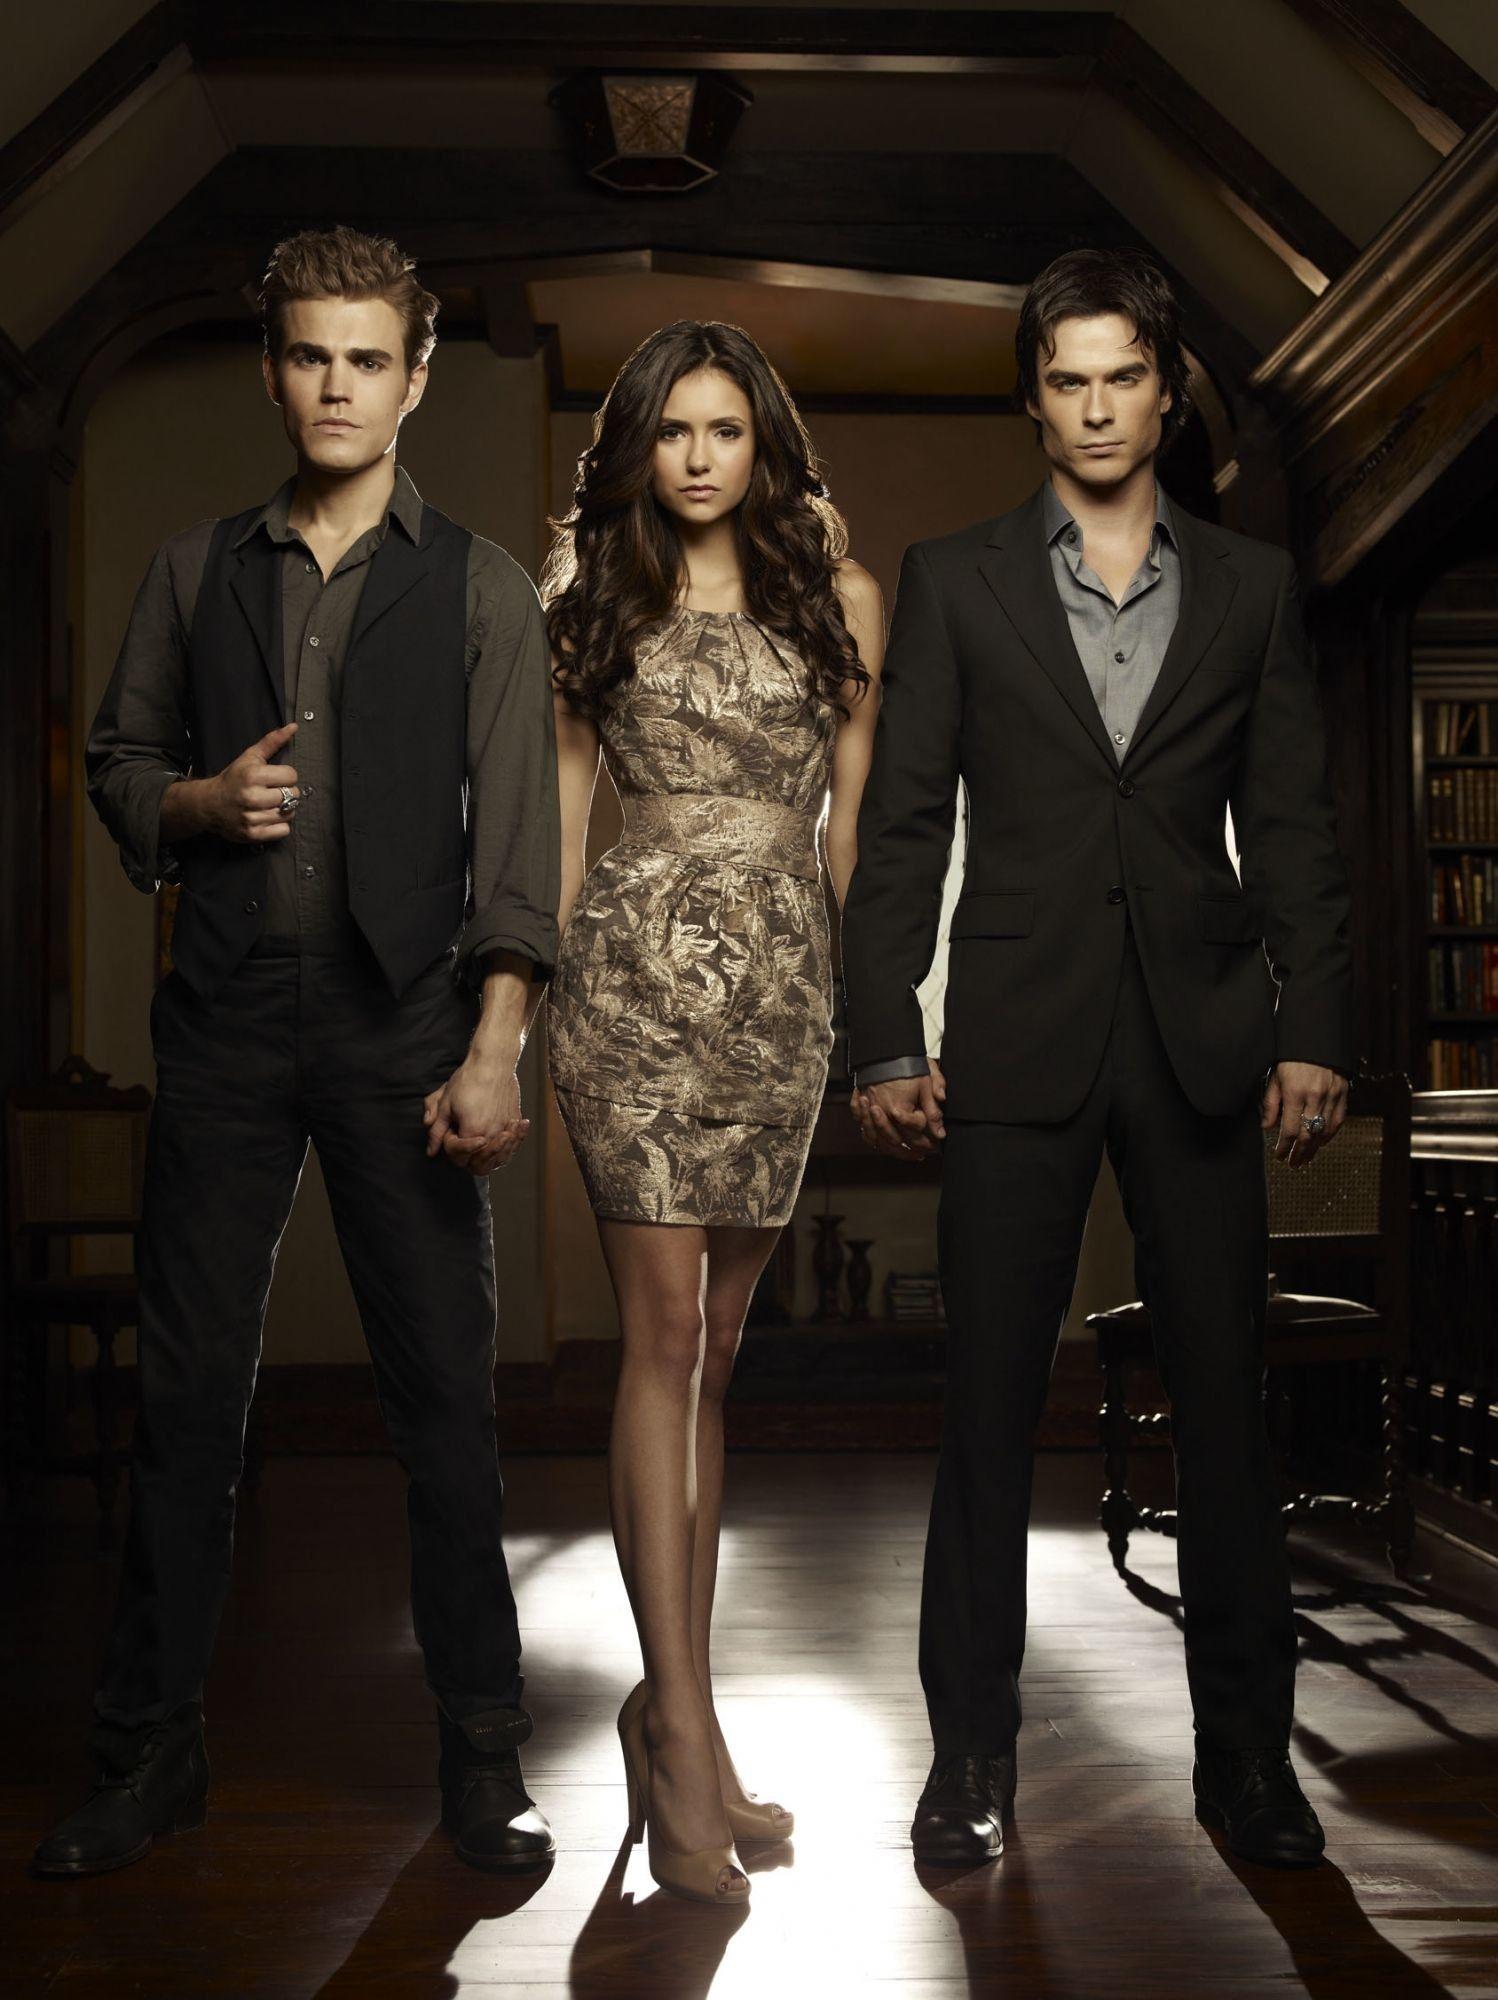 1498x2000 THE VAMPIRE DIARIES wallpaper photo Stefan, Elena and Damon